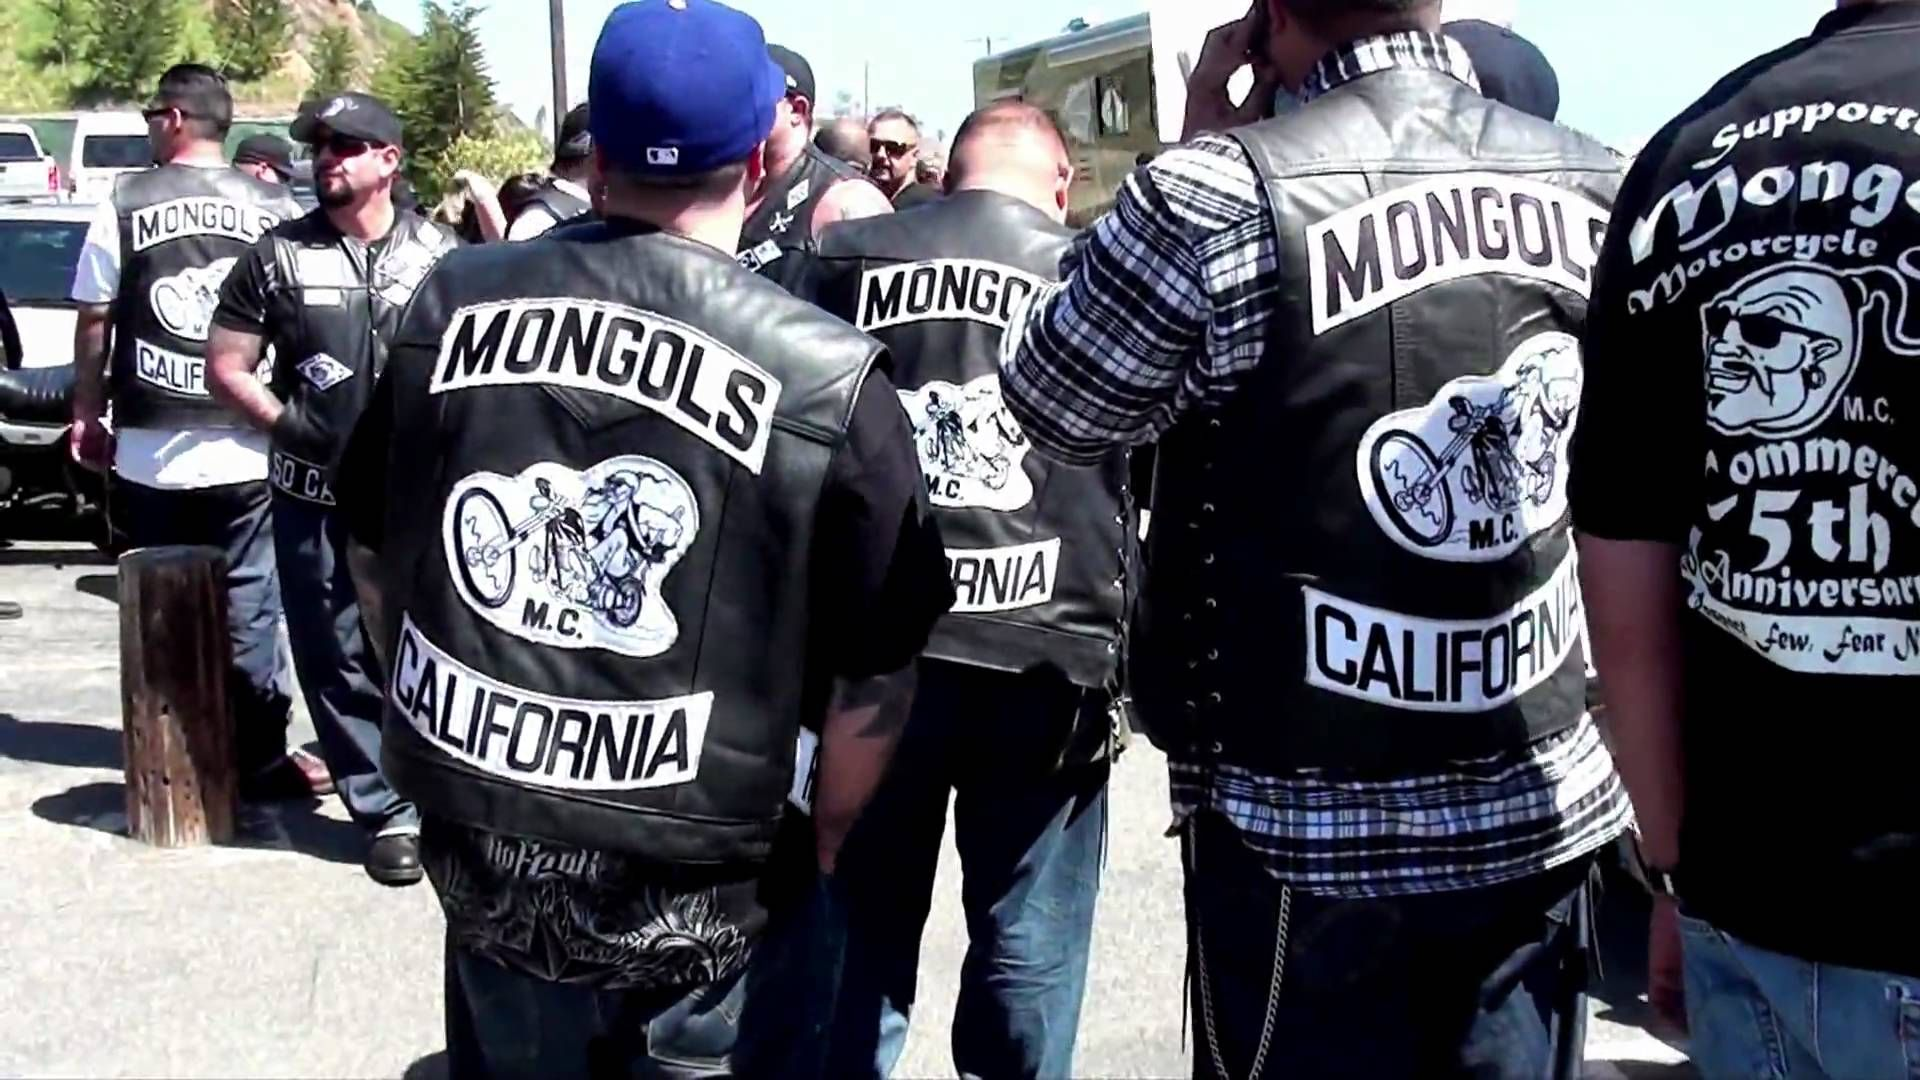 Mongols Mc Riding Motorcycle Clubs Motorcycle Gang Motorcycle